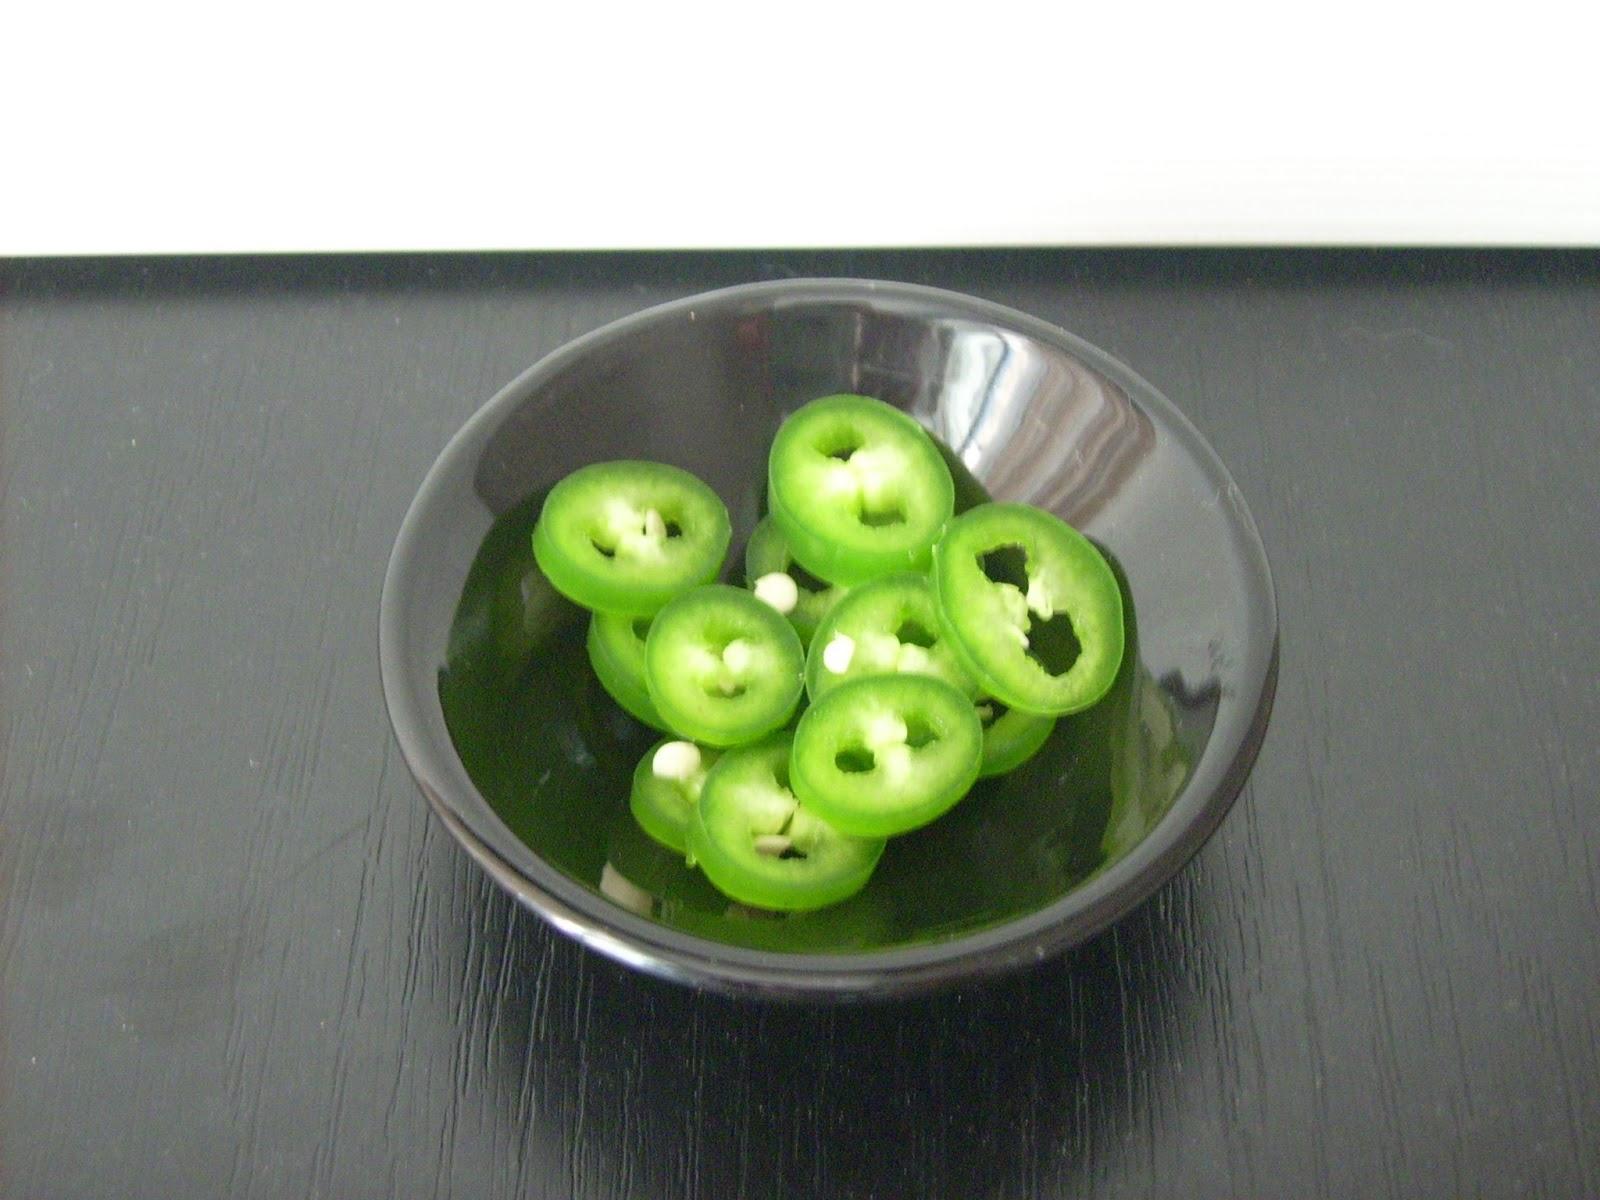 chili, green chili